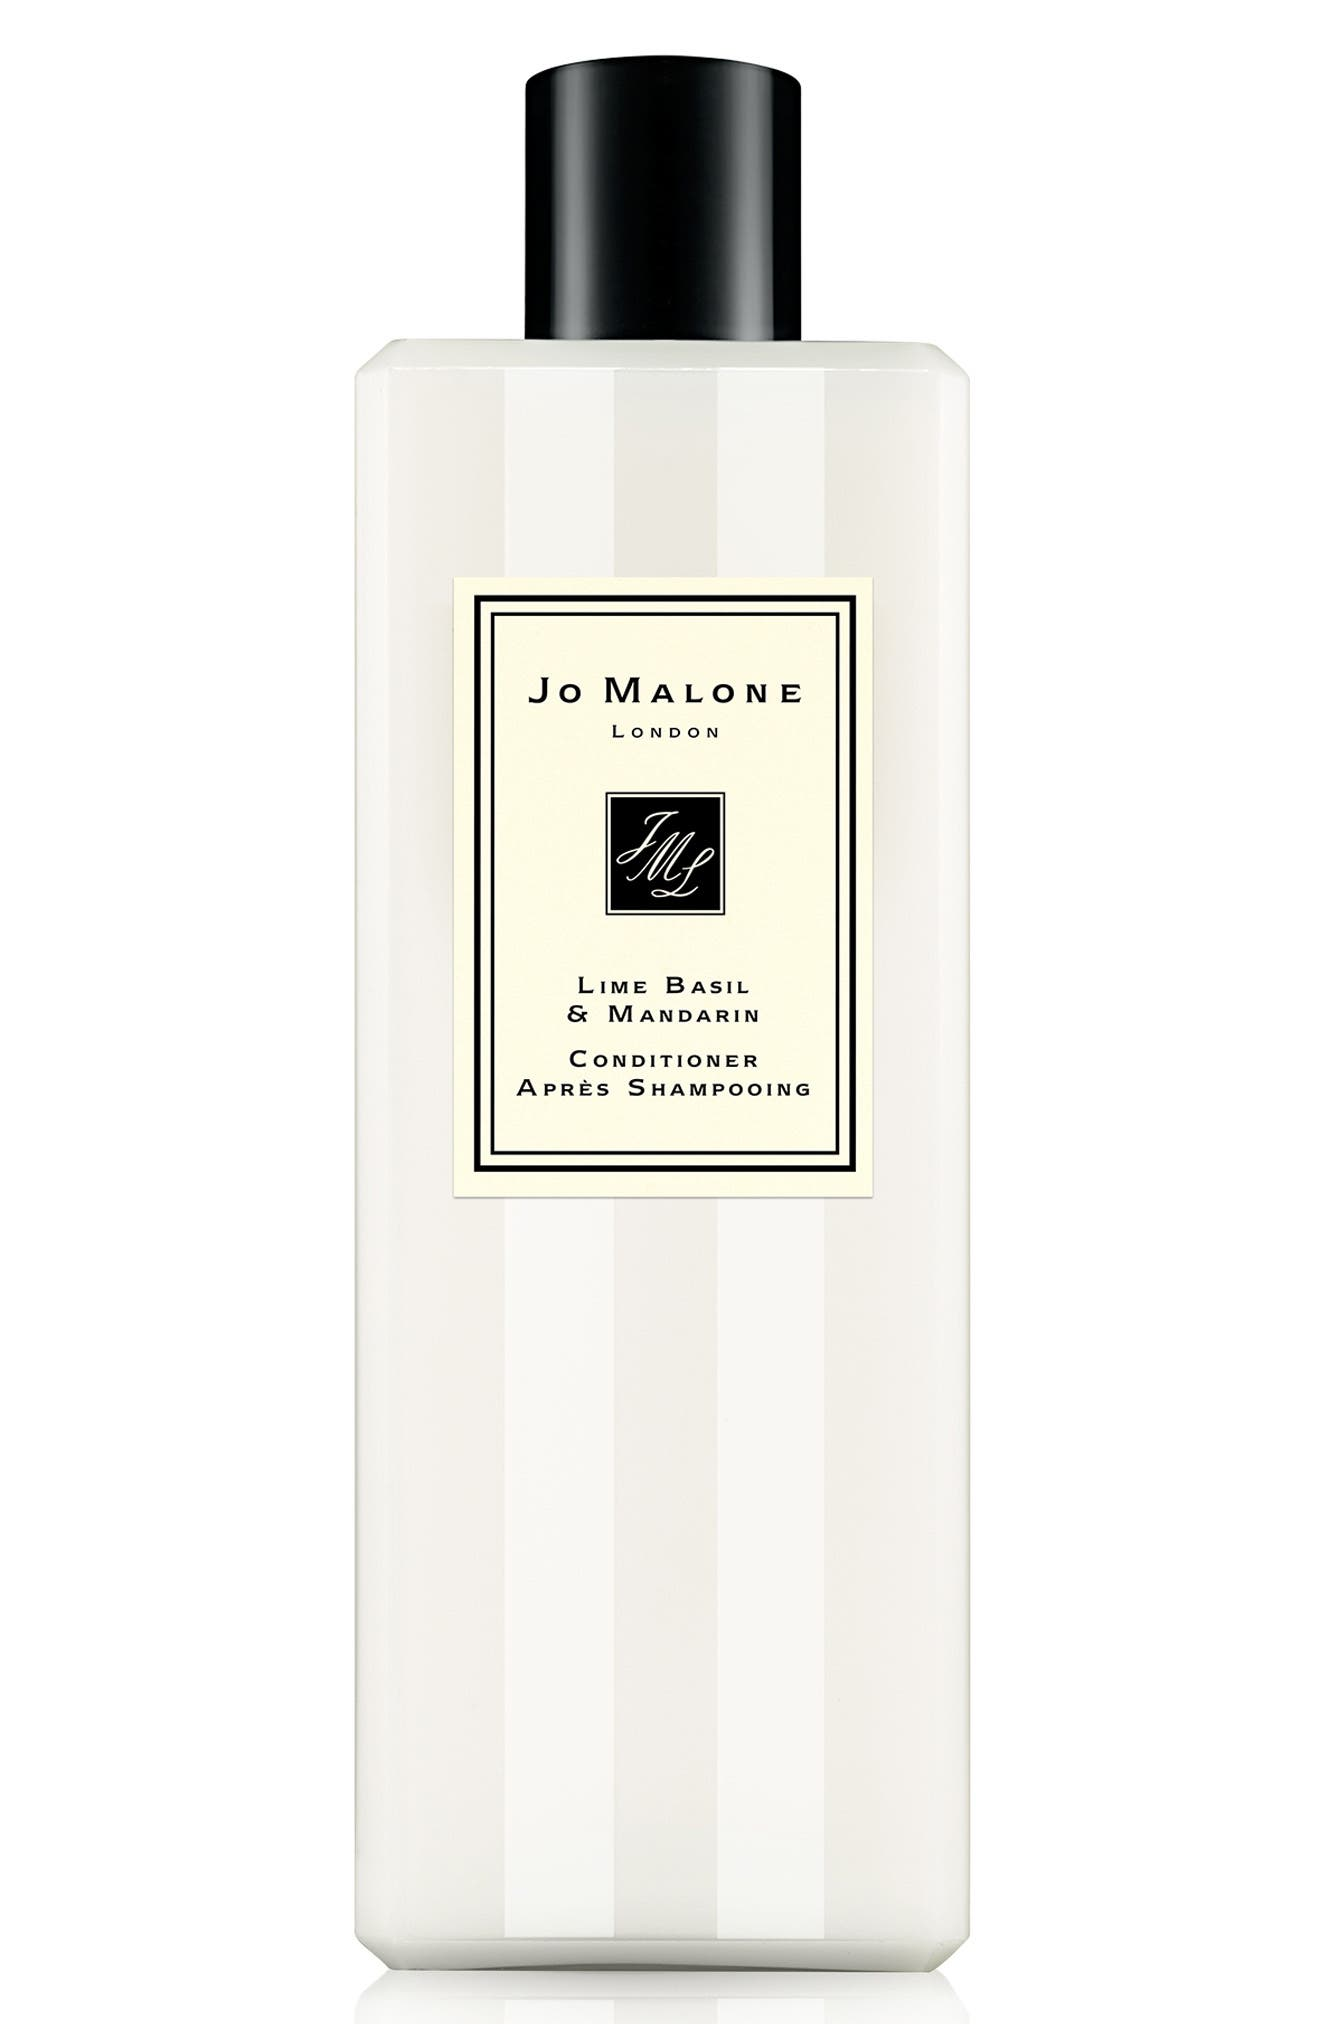 JO MALONE LONDON™ 'Lime Basil & Mandarin' Conditioner